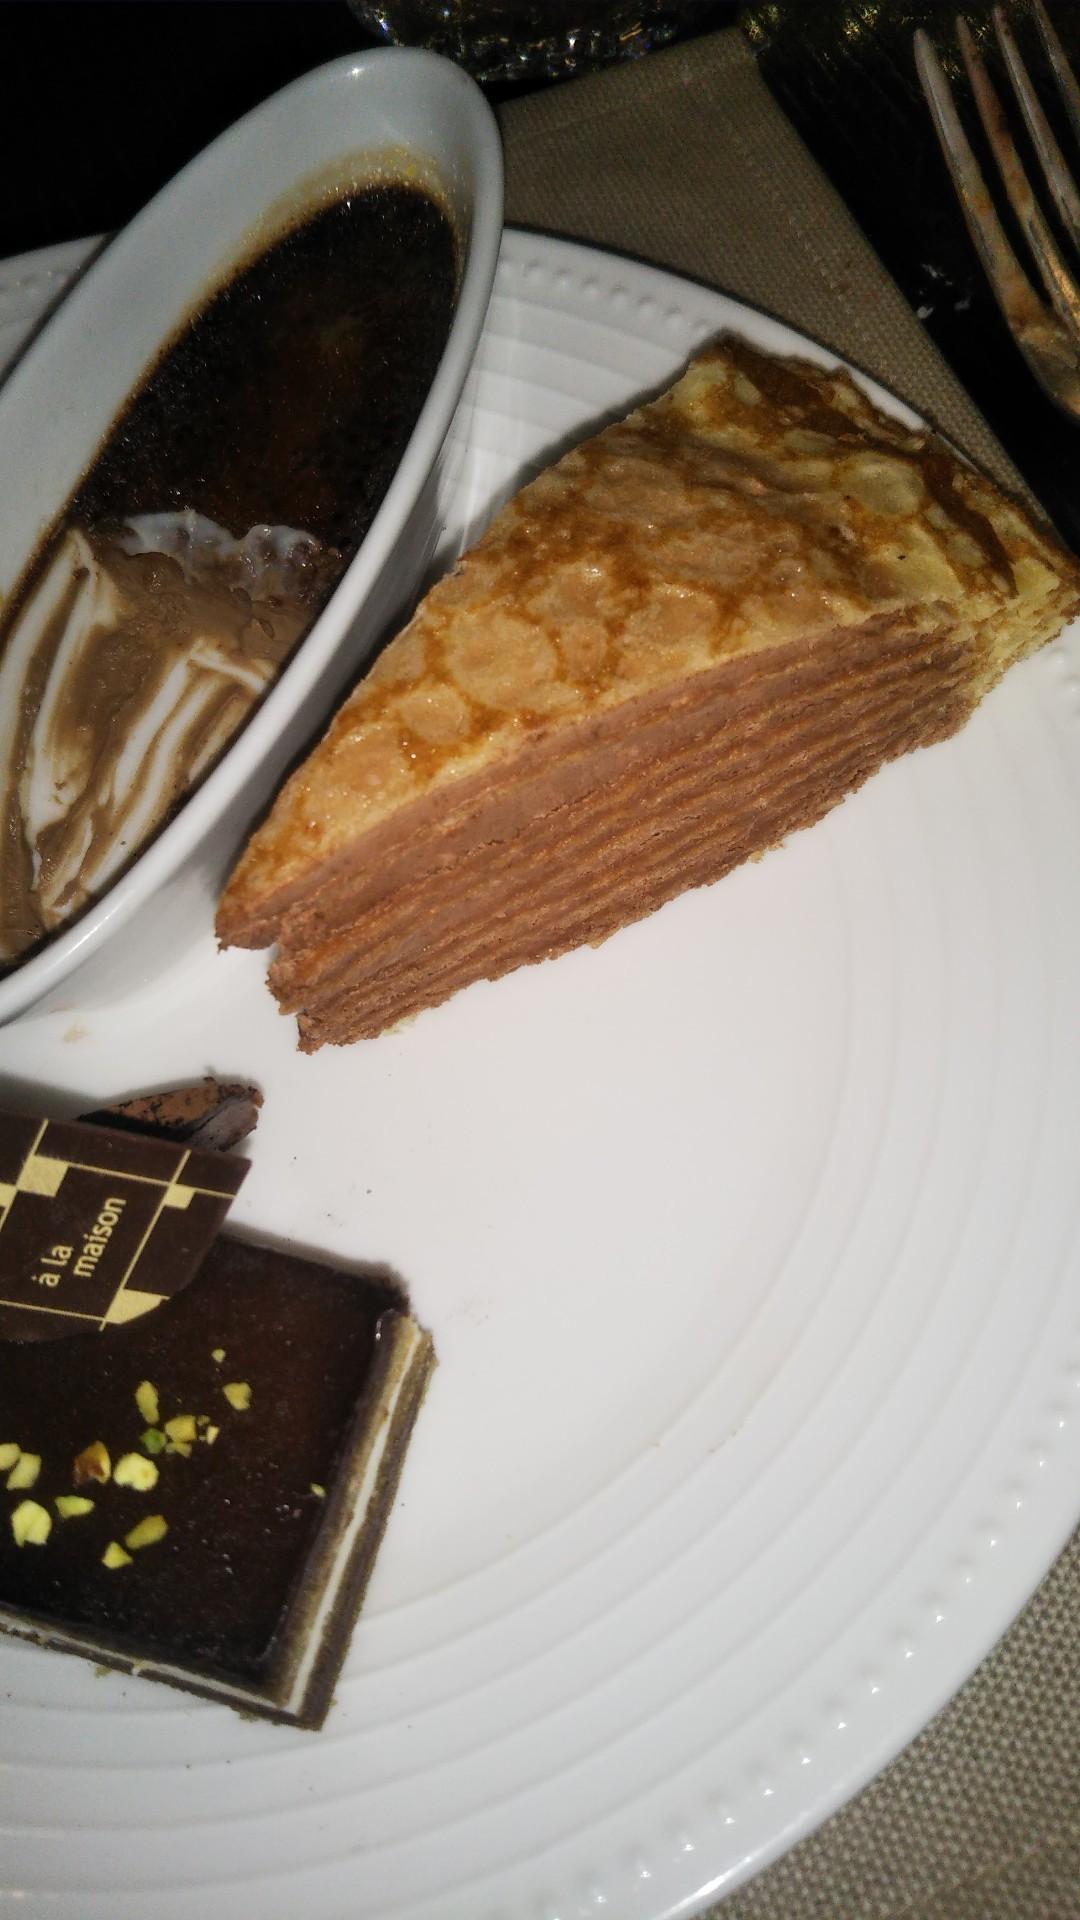 ANAインターコンチネンタルホテル東京 シャンパン・バー チョコレート・スイーツブッフェ_f0076001_22053684.jpg